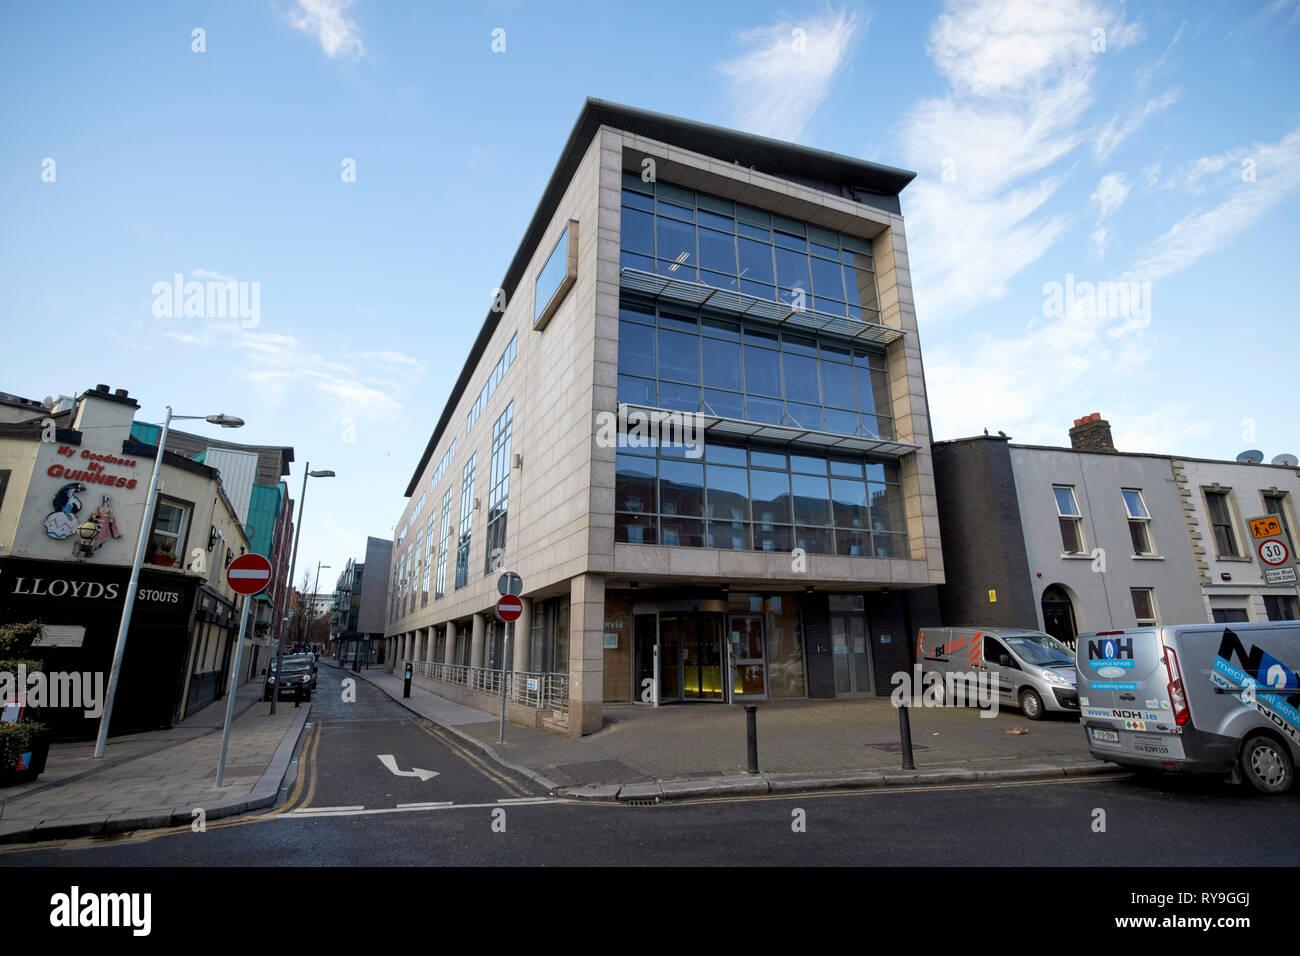 Ervia Bord Gais Energy Irish water building on Foley street Dublin Republic of Ireland Europe - Stock Image